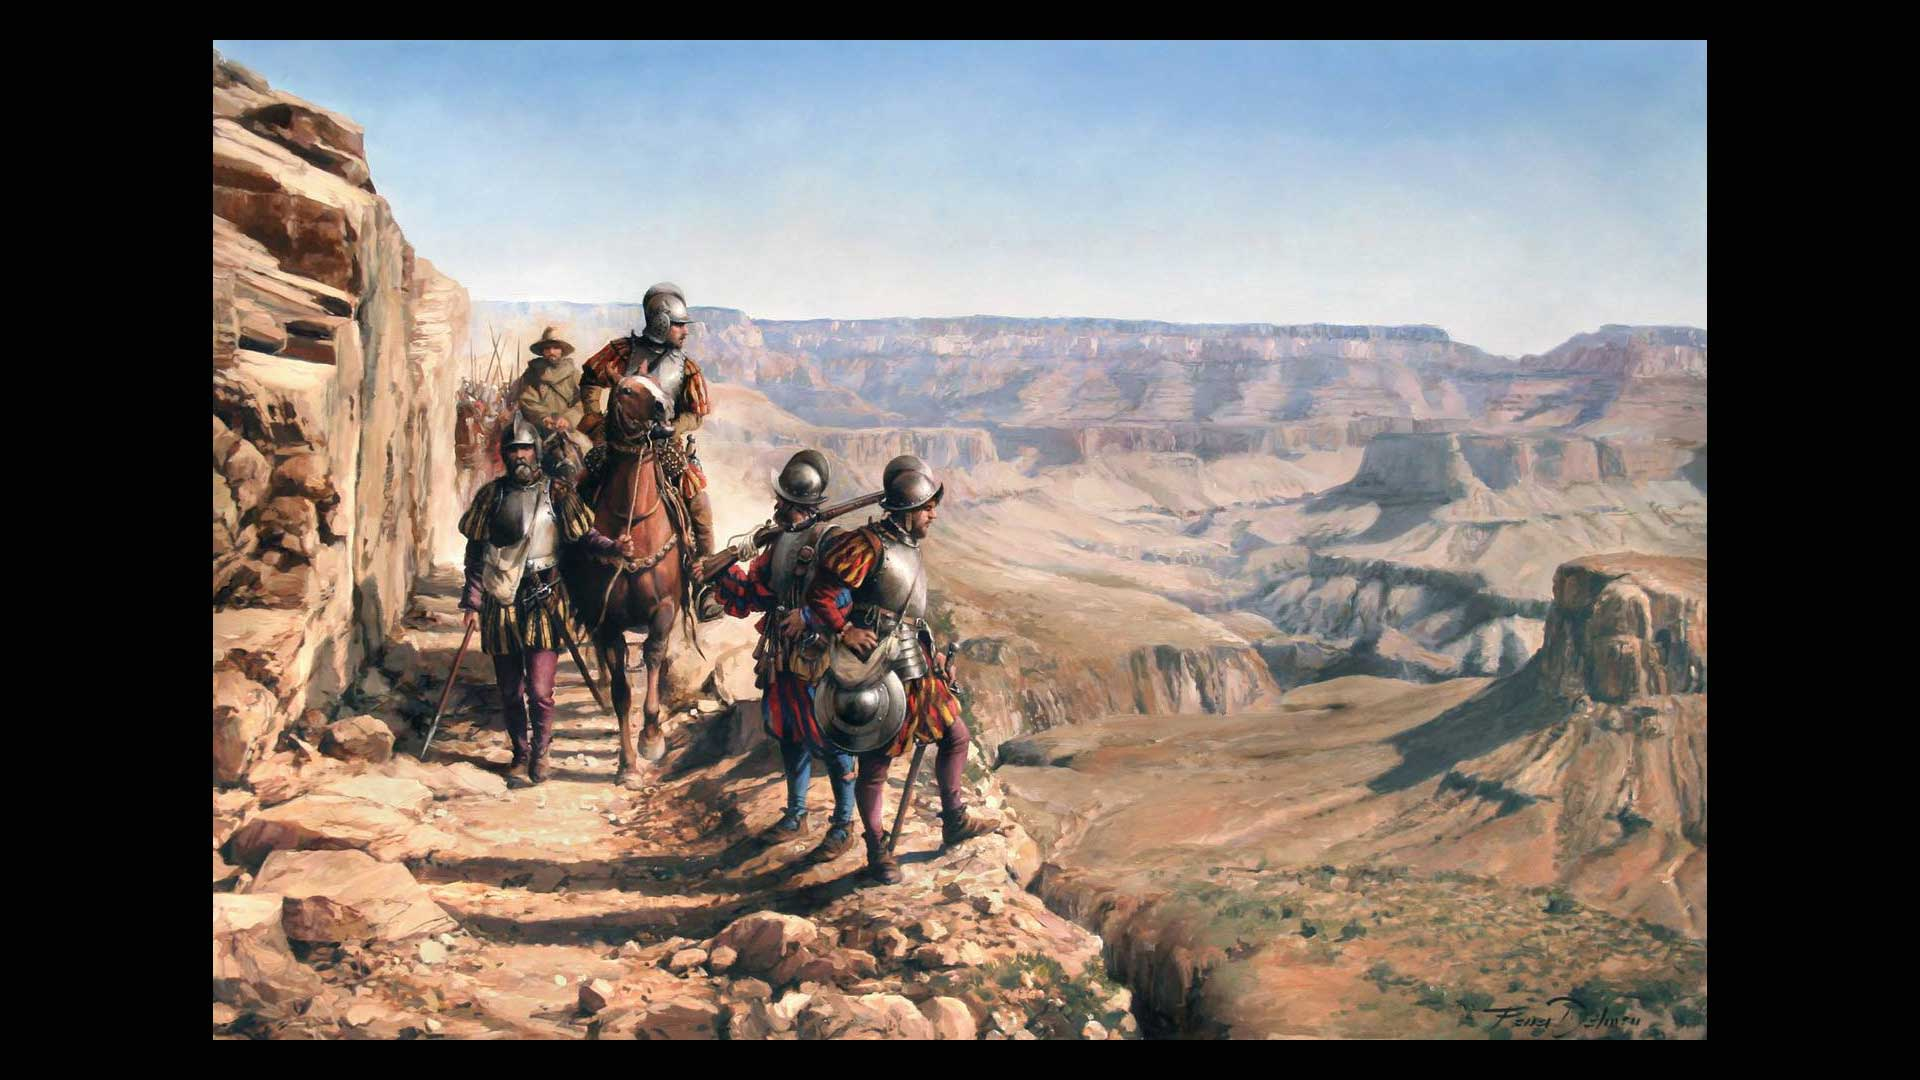 "Image titled ""La conquista del Colorado,"" by Augusto Ferrer-Dalmau, depicts 16th century Spanish conquistadors in the Grand Canyon."